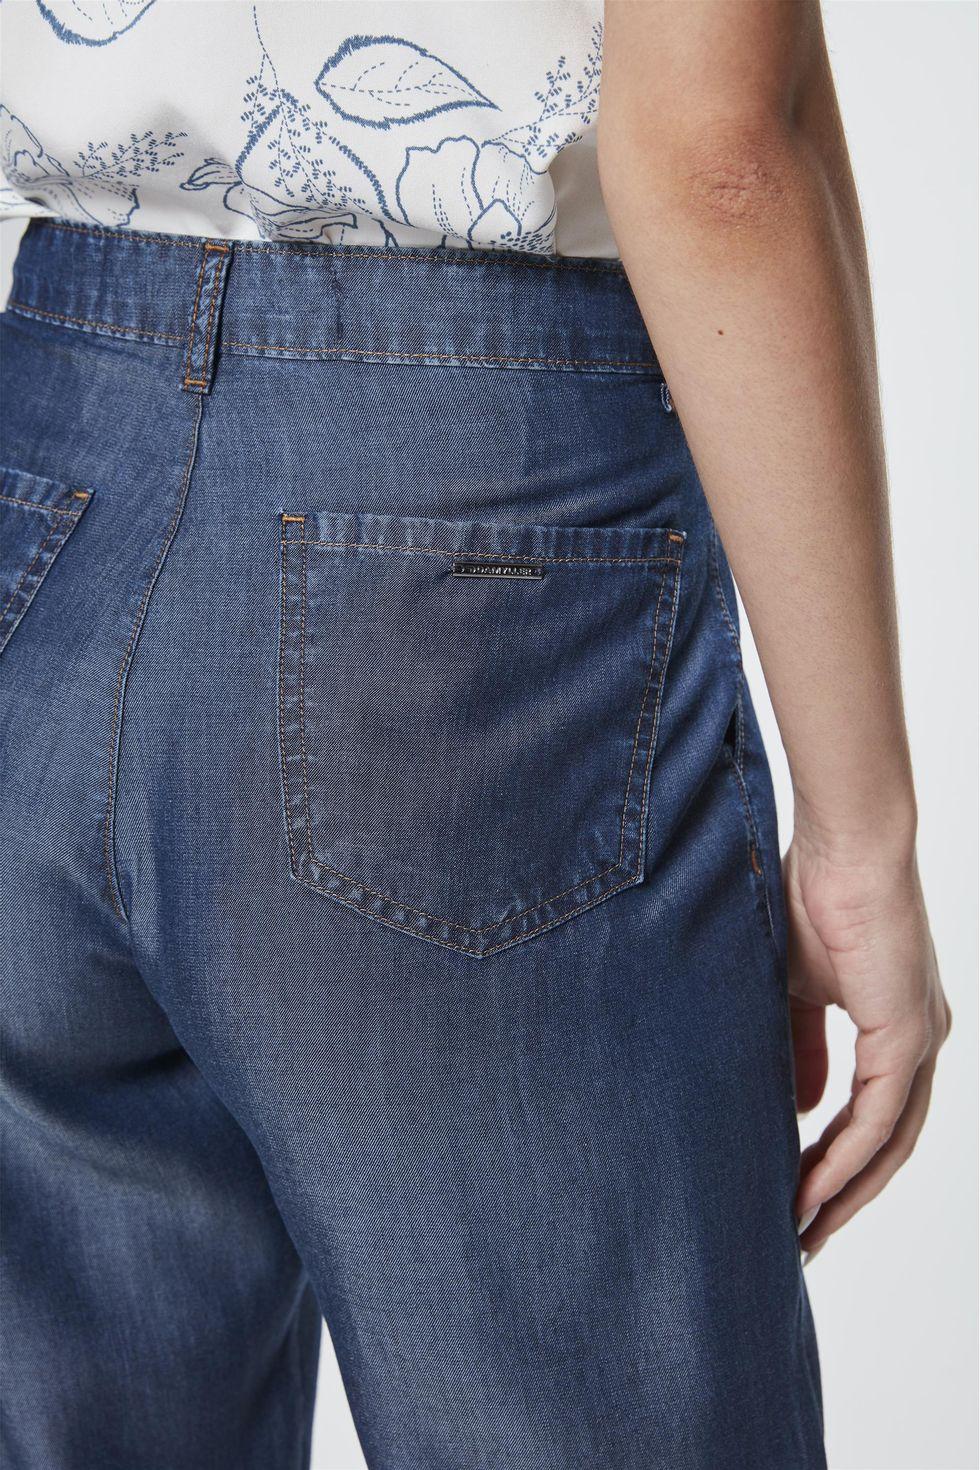 Calca-Jeans-Reta-Cropped-Feminina-Frente--